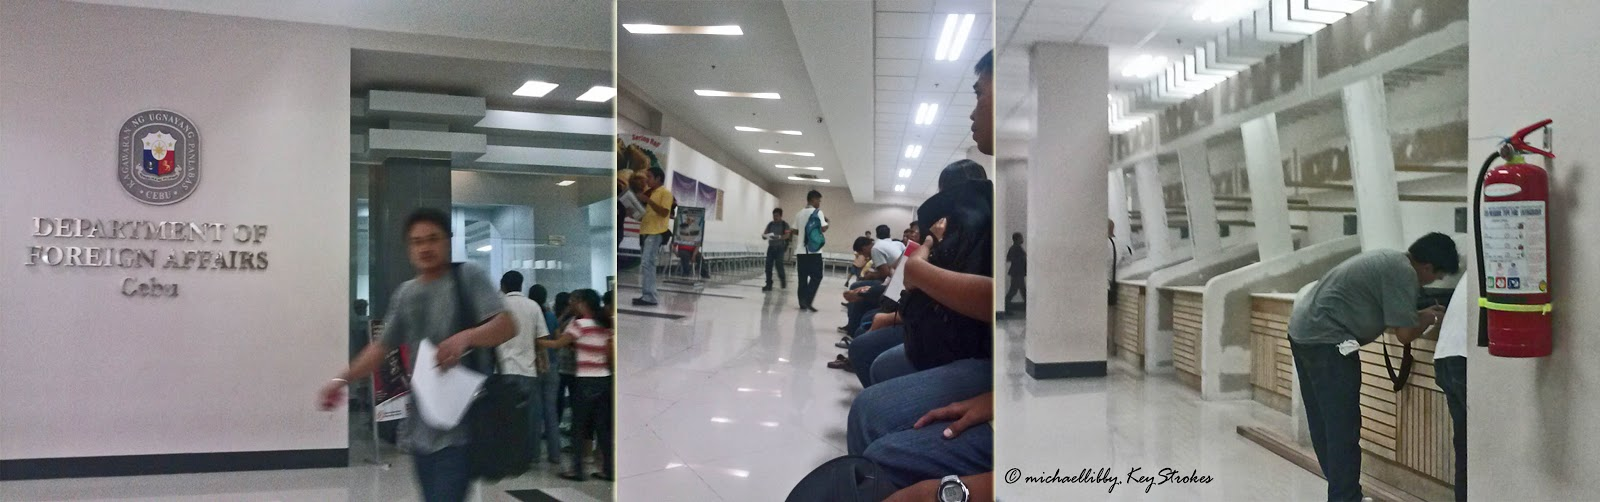 Key Strokes Finding DFA  Cebu